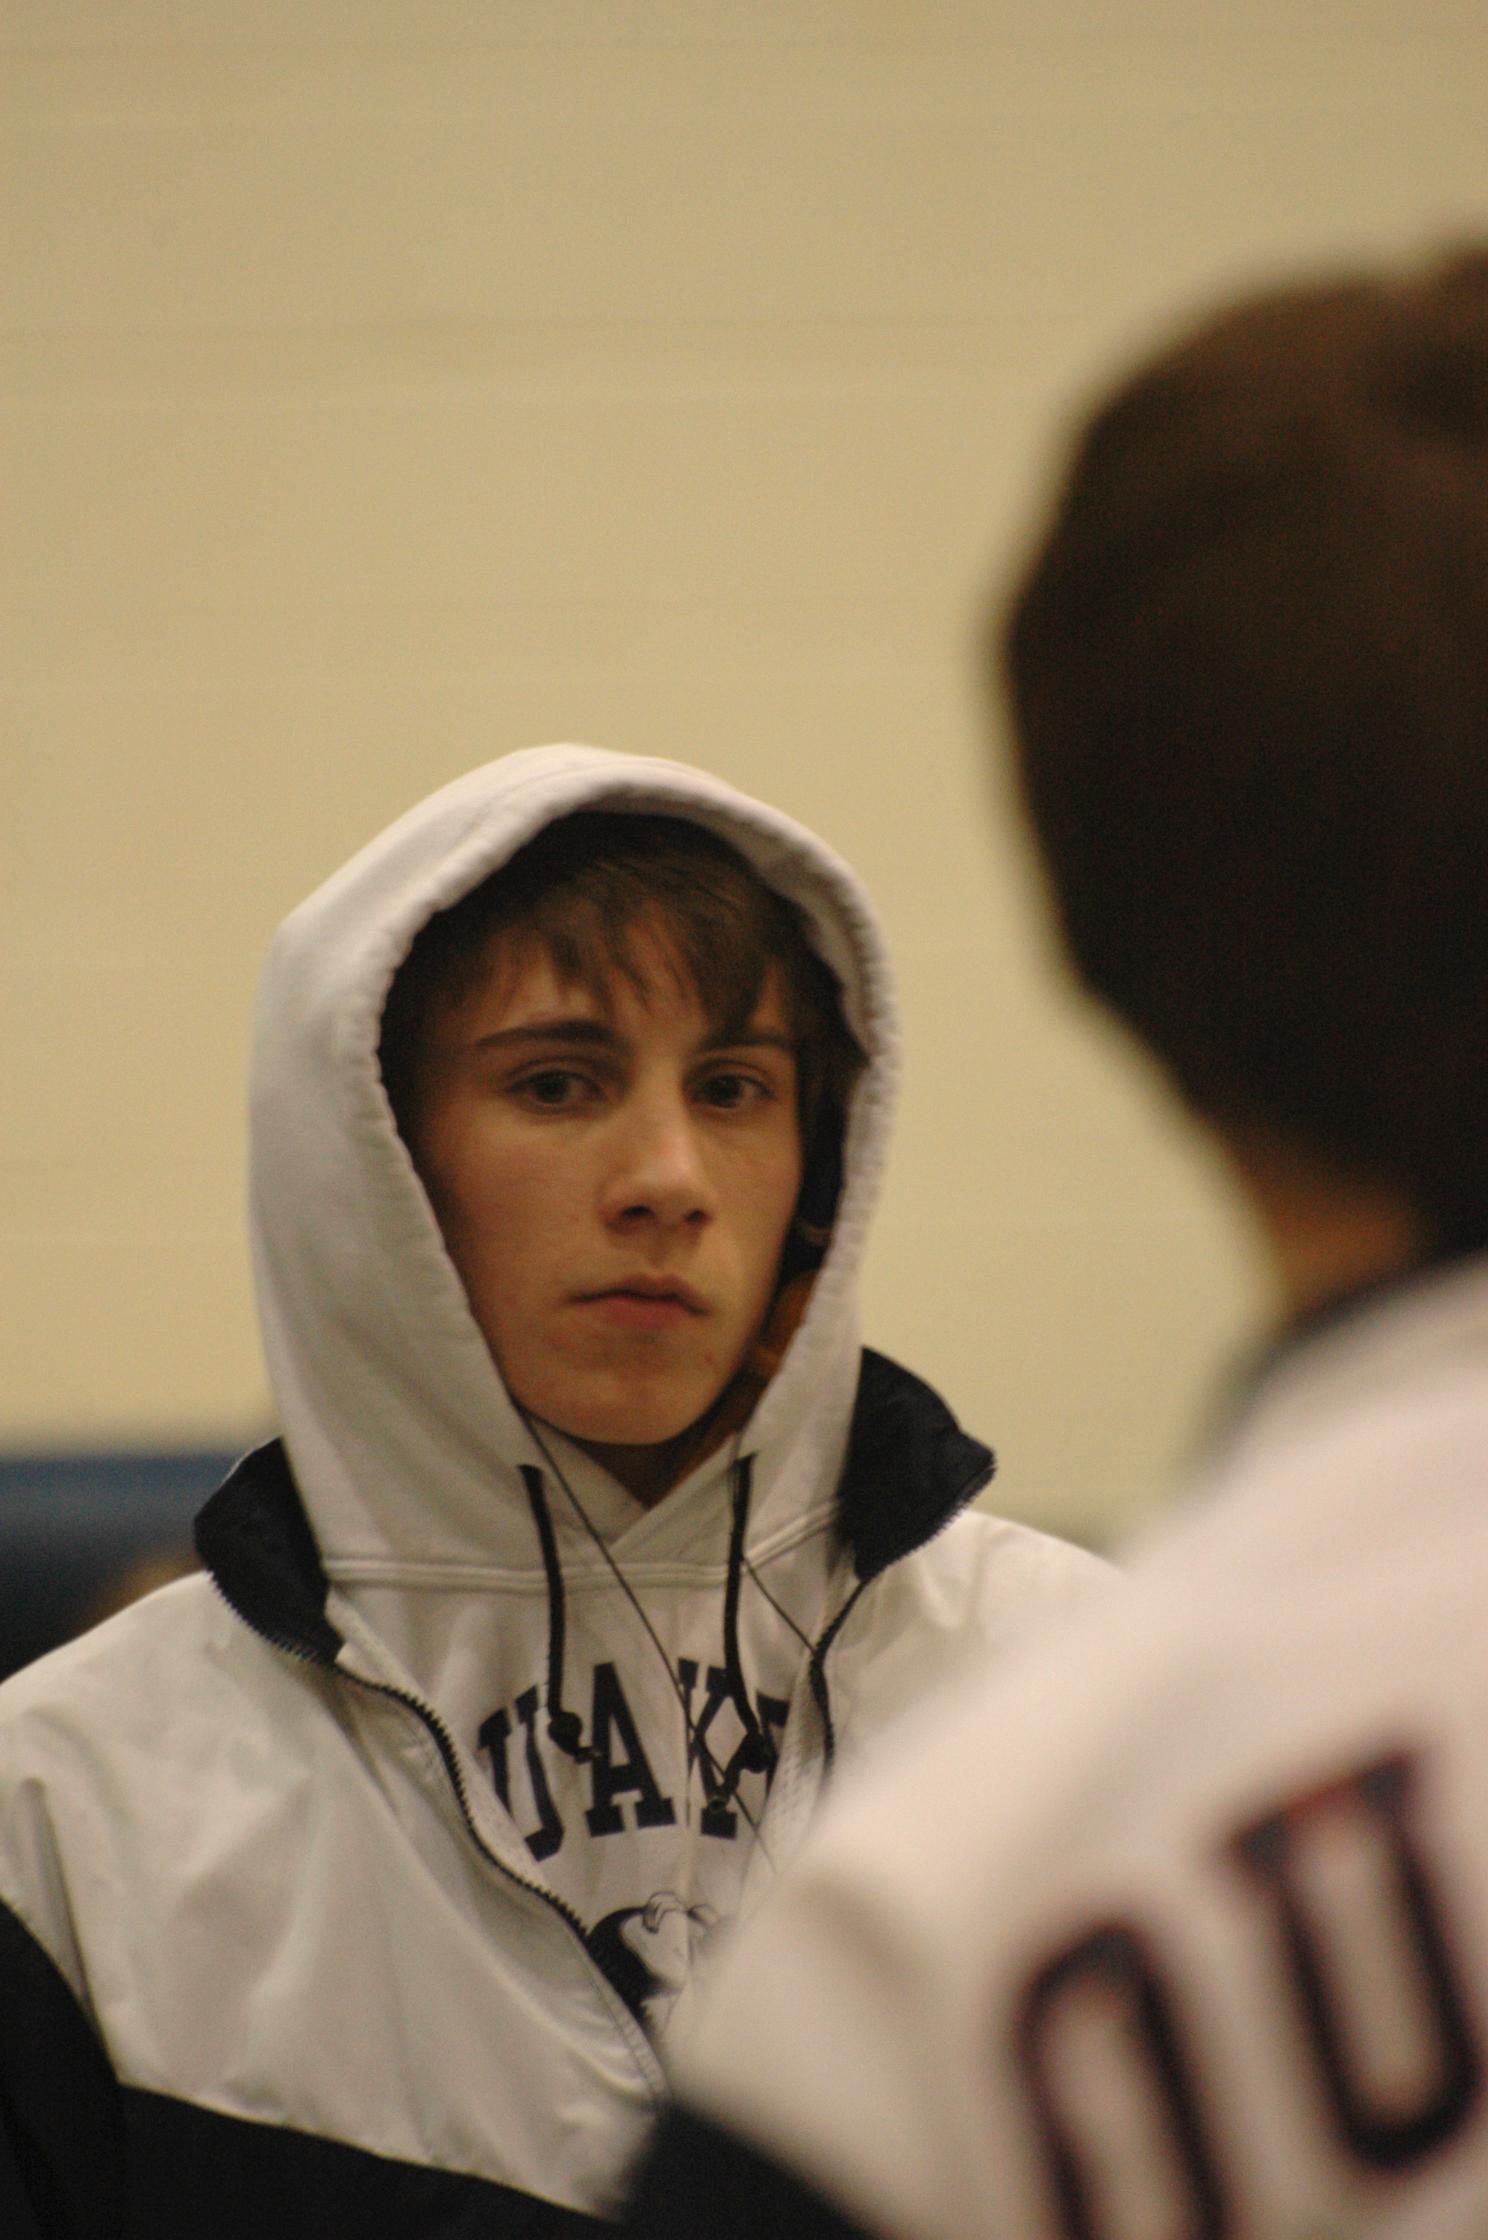 Evan wrestling